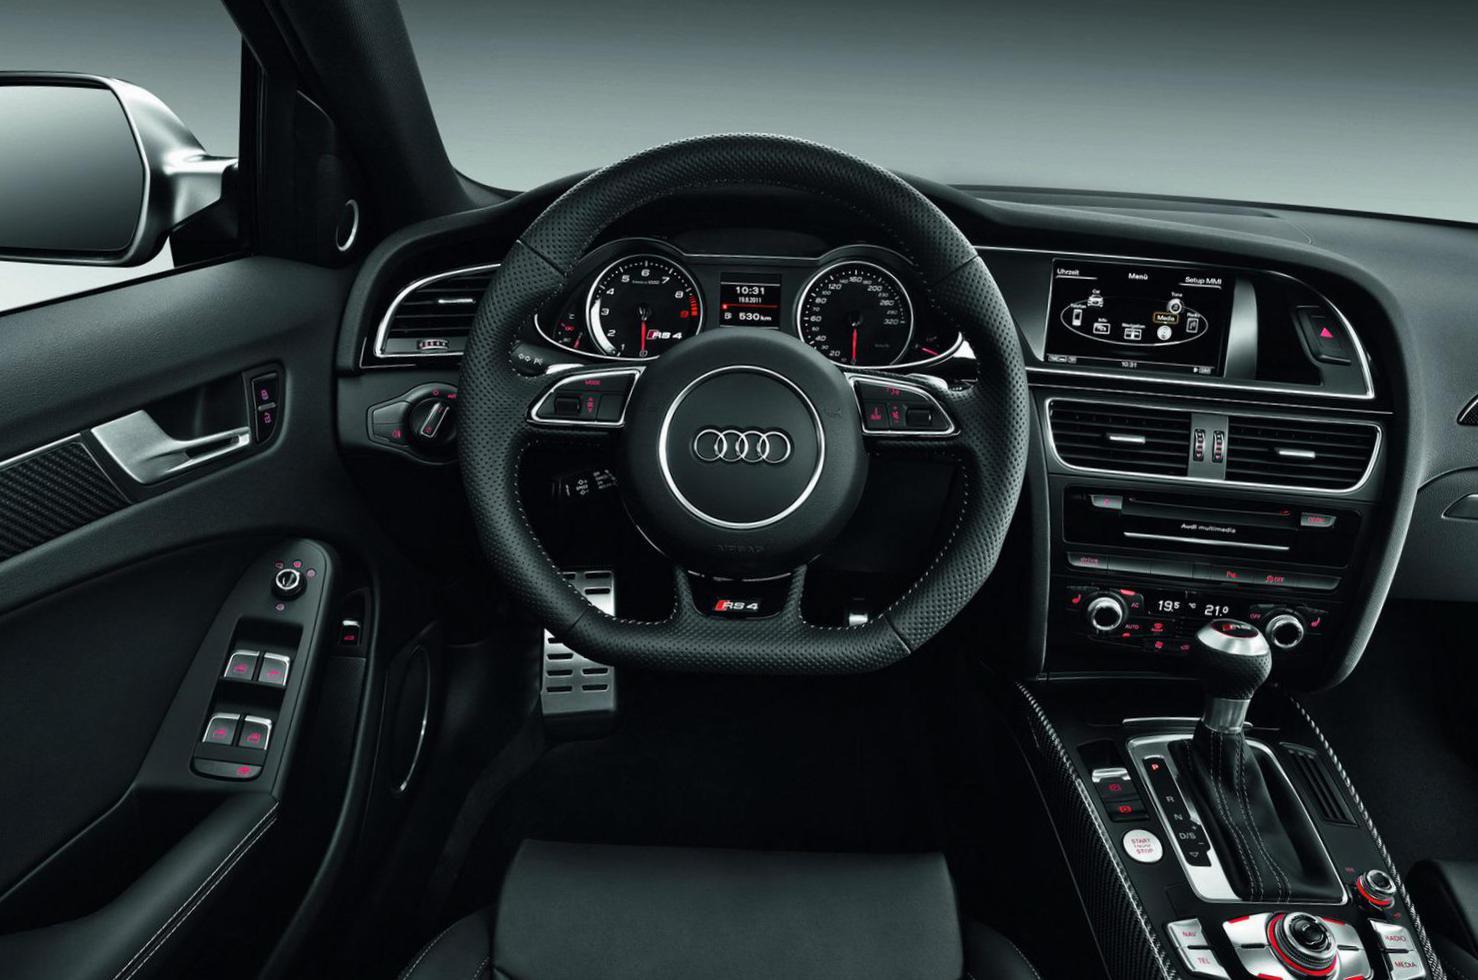 Audi Rs4 Avant Photos And Specs Photo Rs4 Avant Audi Specs And 26